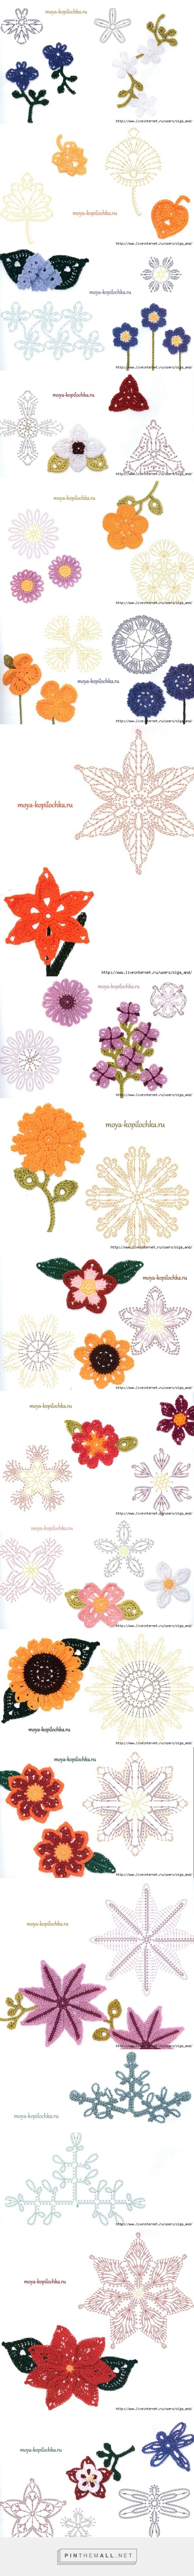 fiori e foglie... - a grouped images picture - Pin Them All